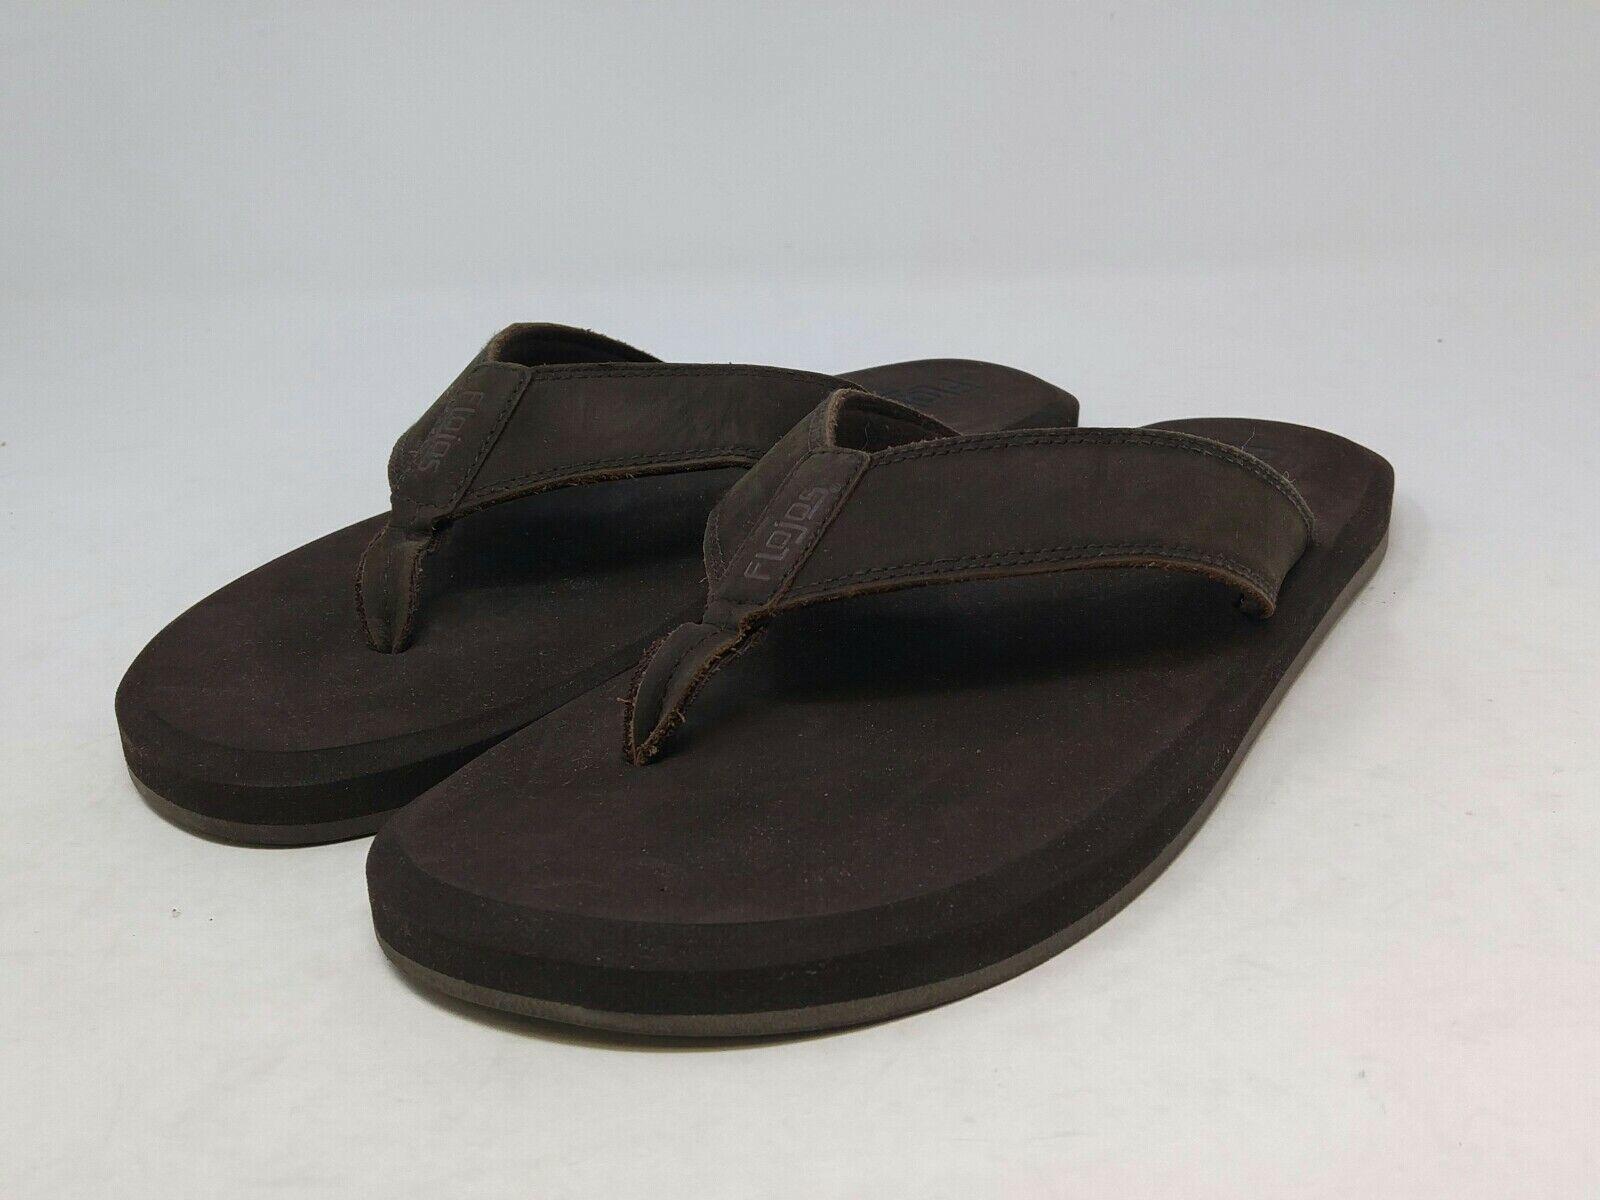 Flojos Men's Brown Sandals 12 US